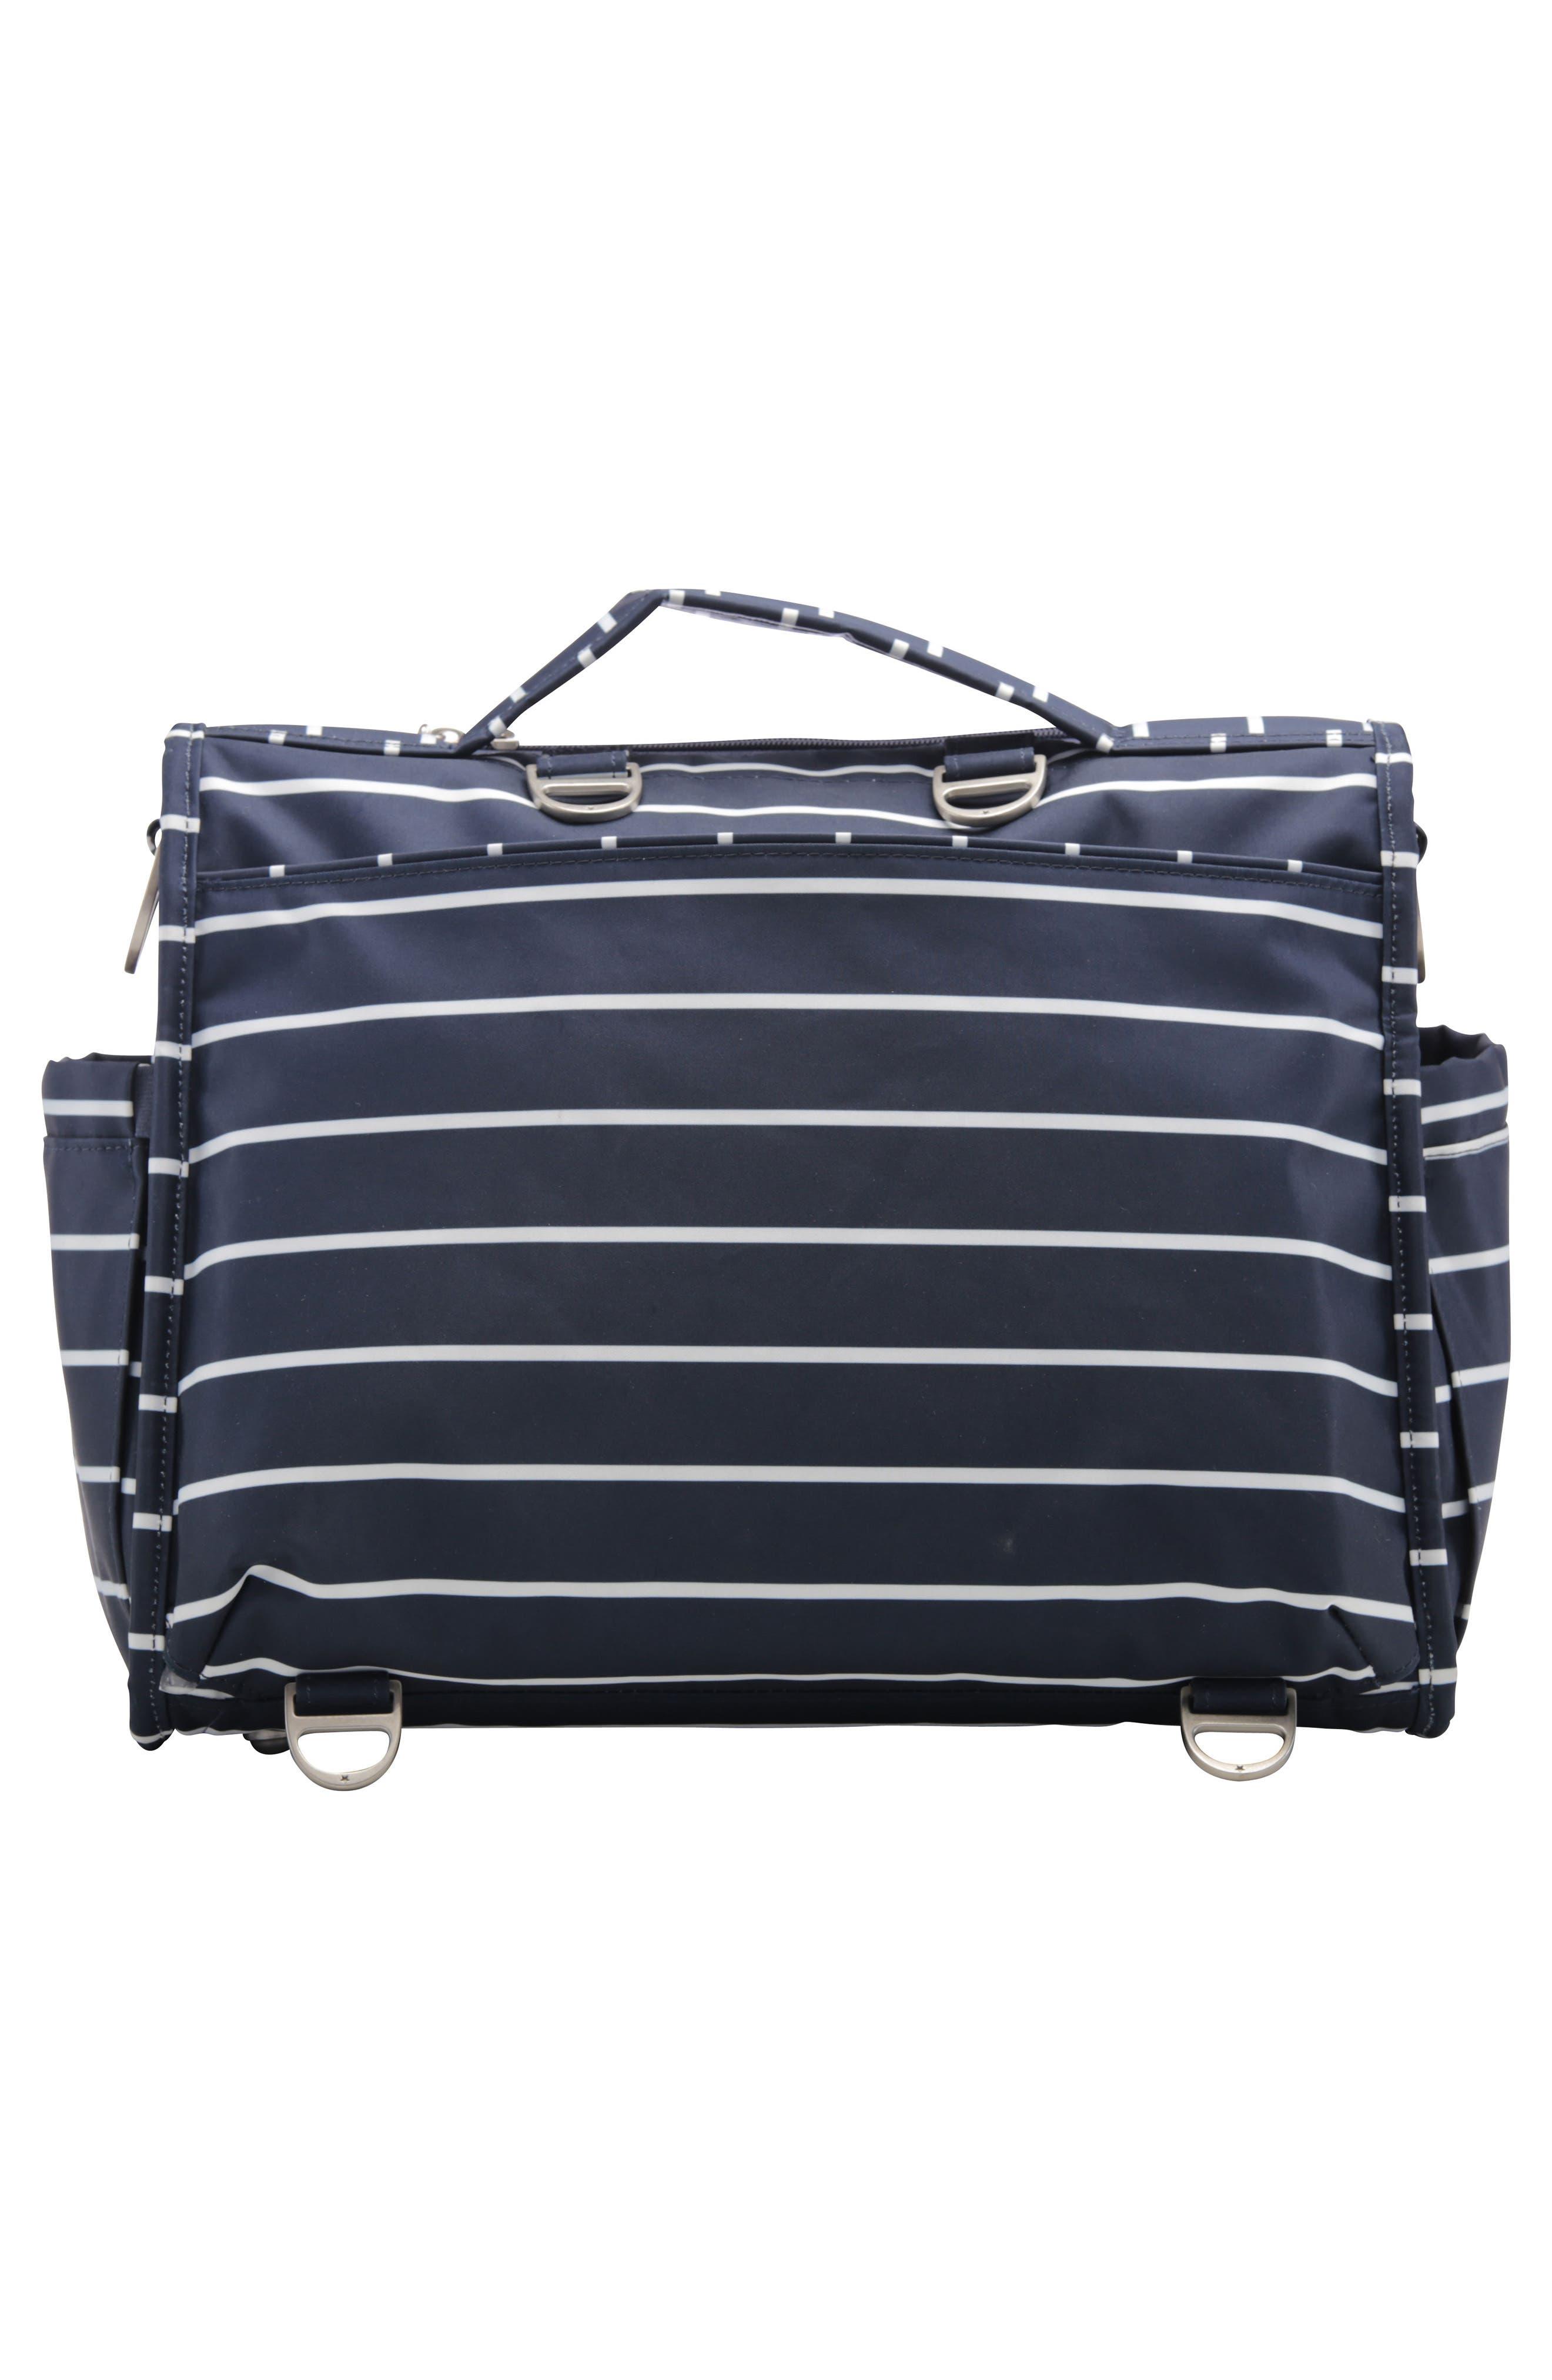 BFF - Coastal Collection Diaper Bag,                             Alternate thumbnail 13, color,